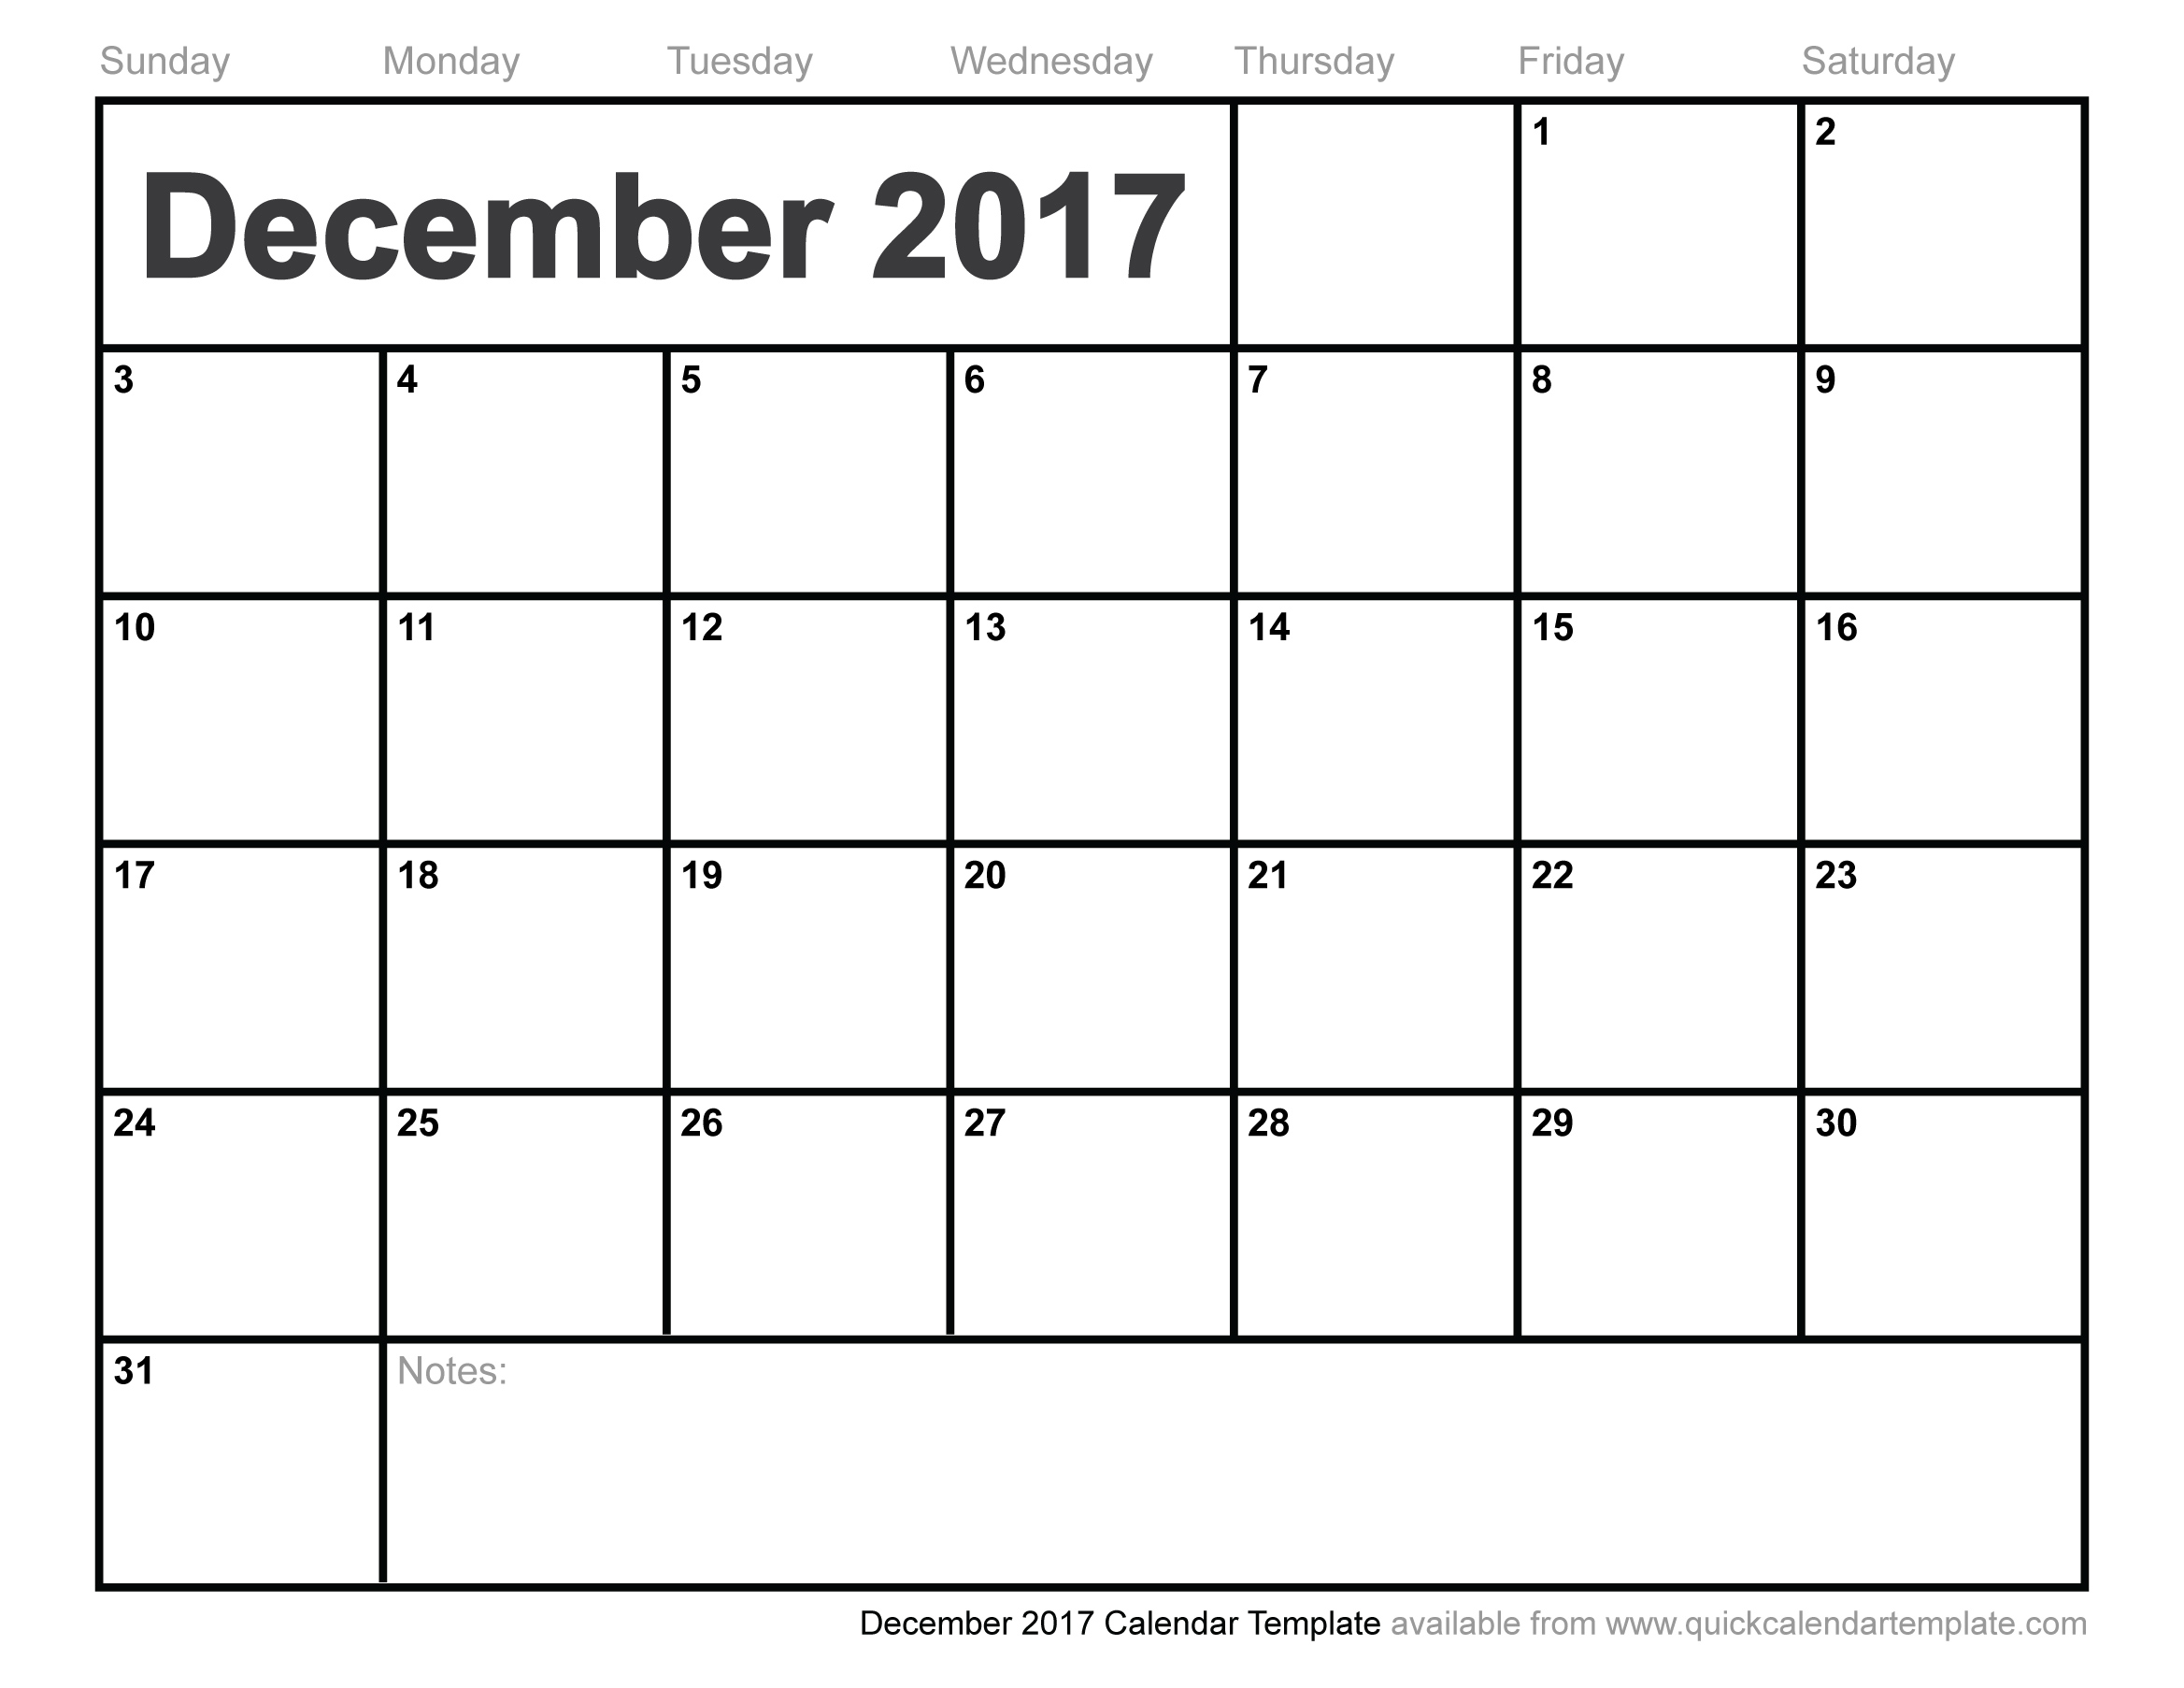 Calendar Cute 2017 Calendar 2017 Calendar Us Holidays 2017